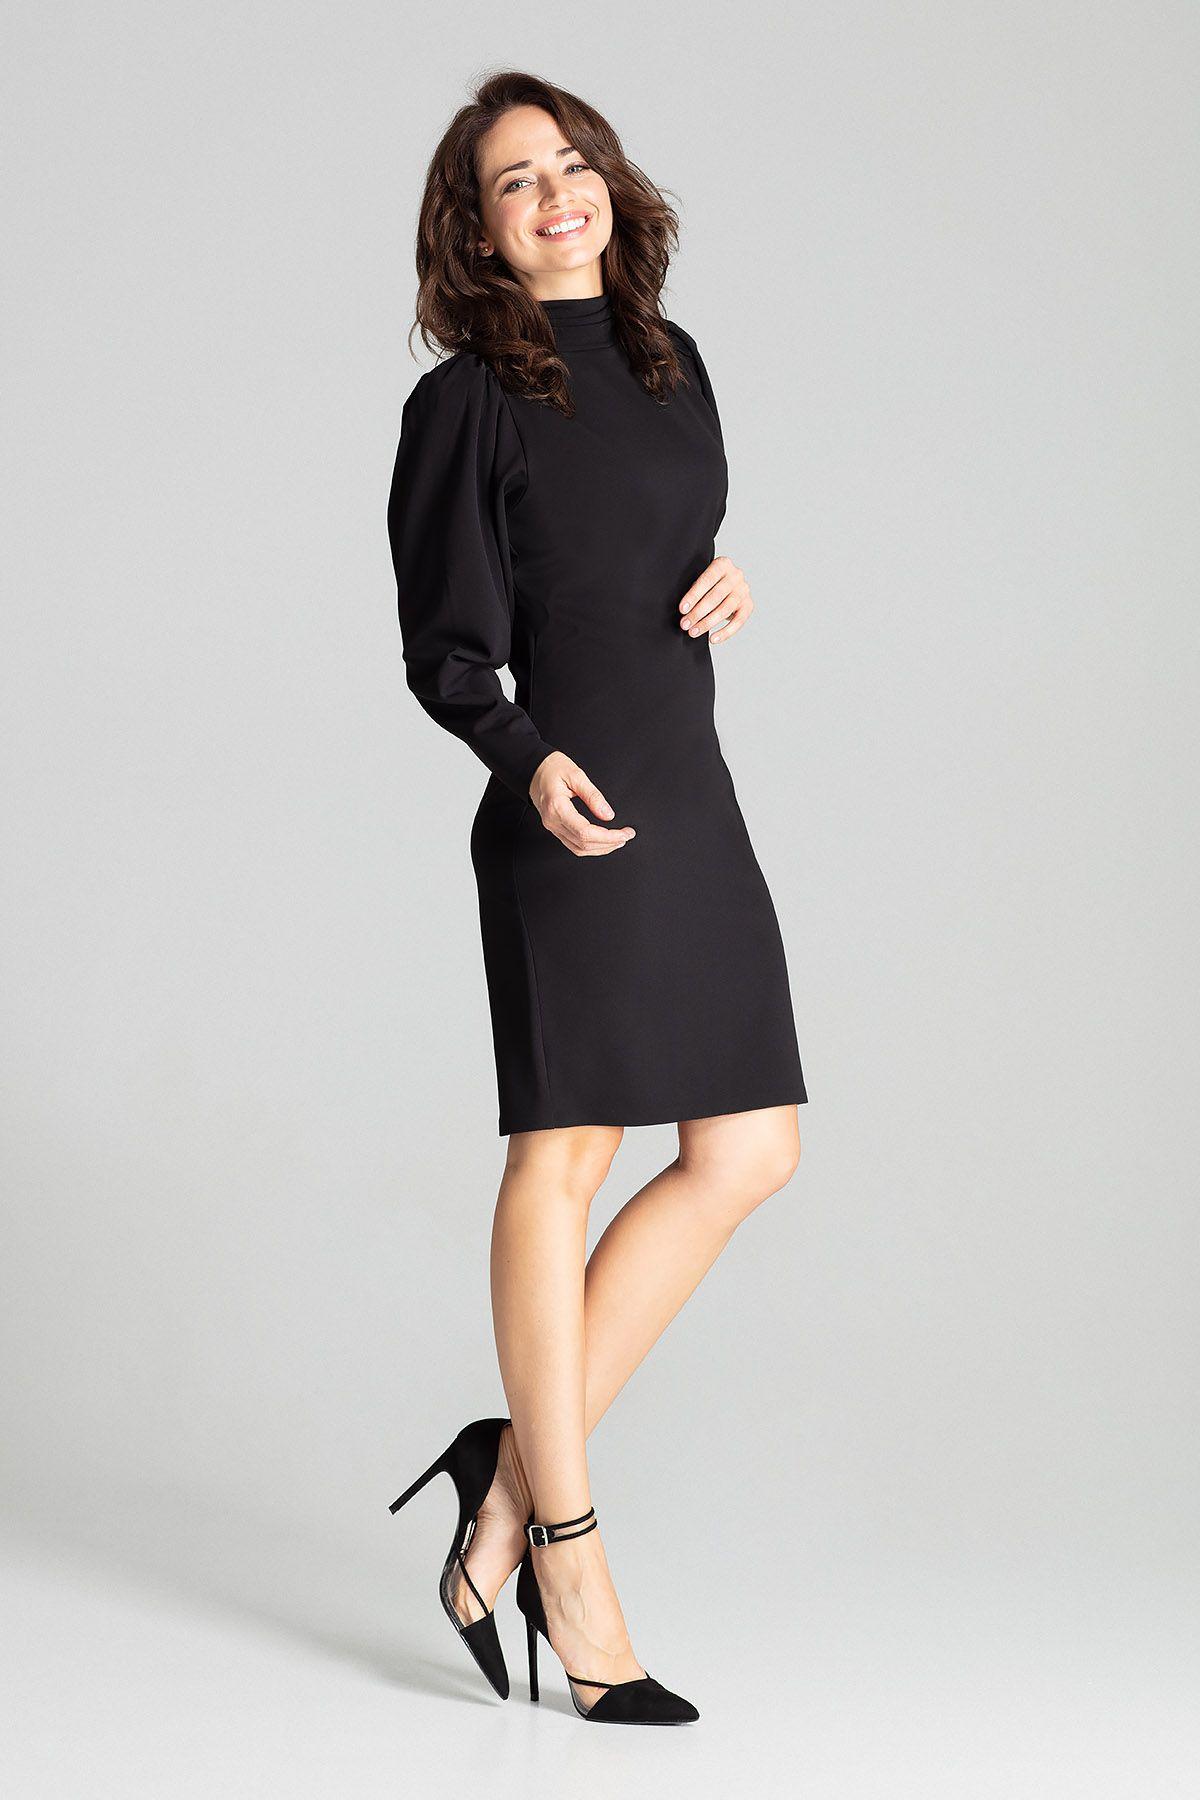 Black Long Sleeve Midi Dress